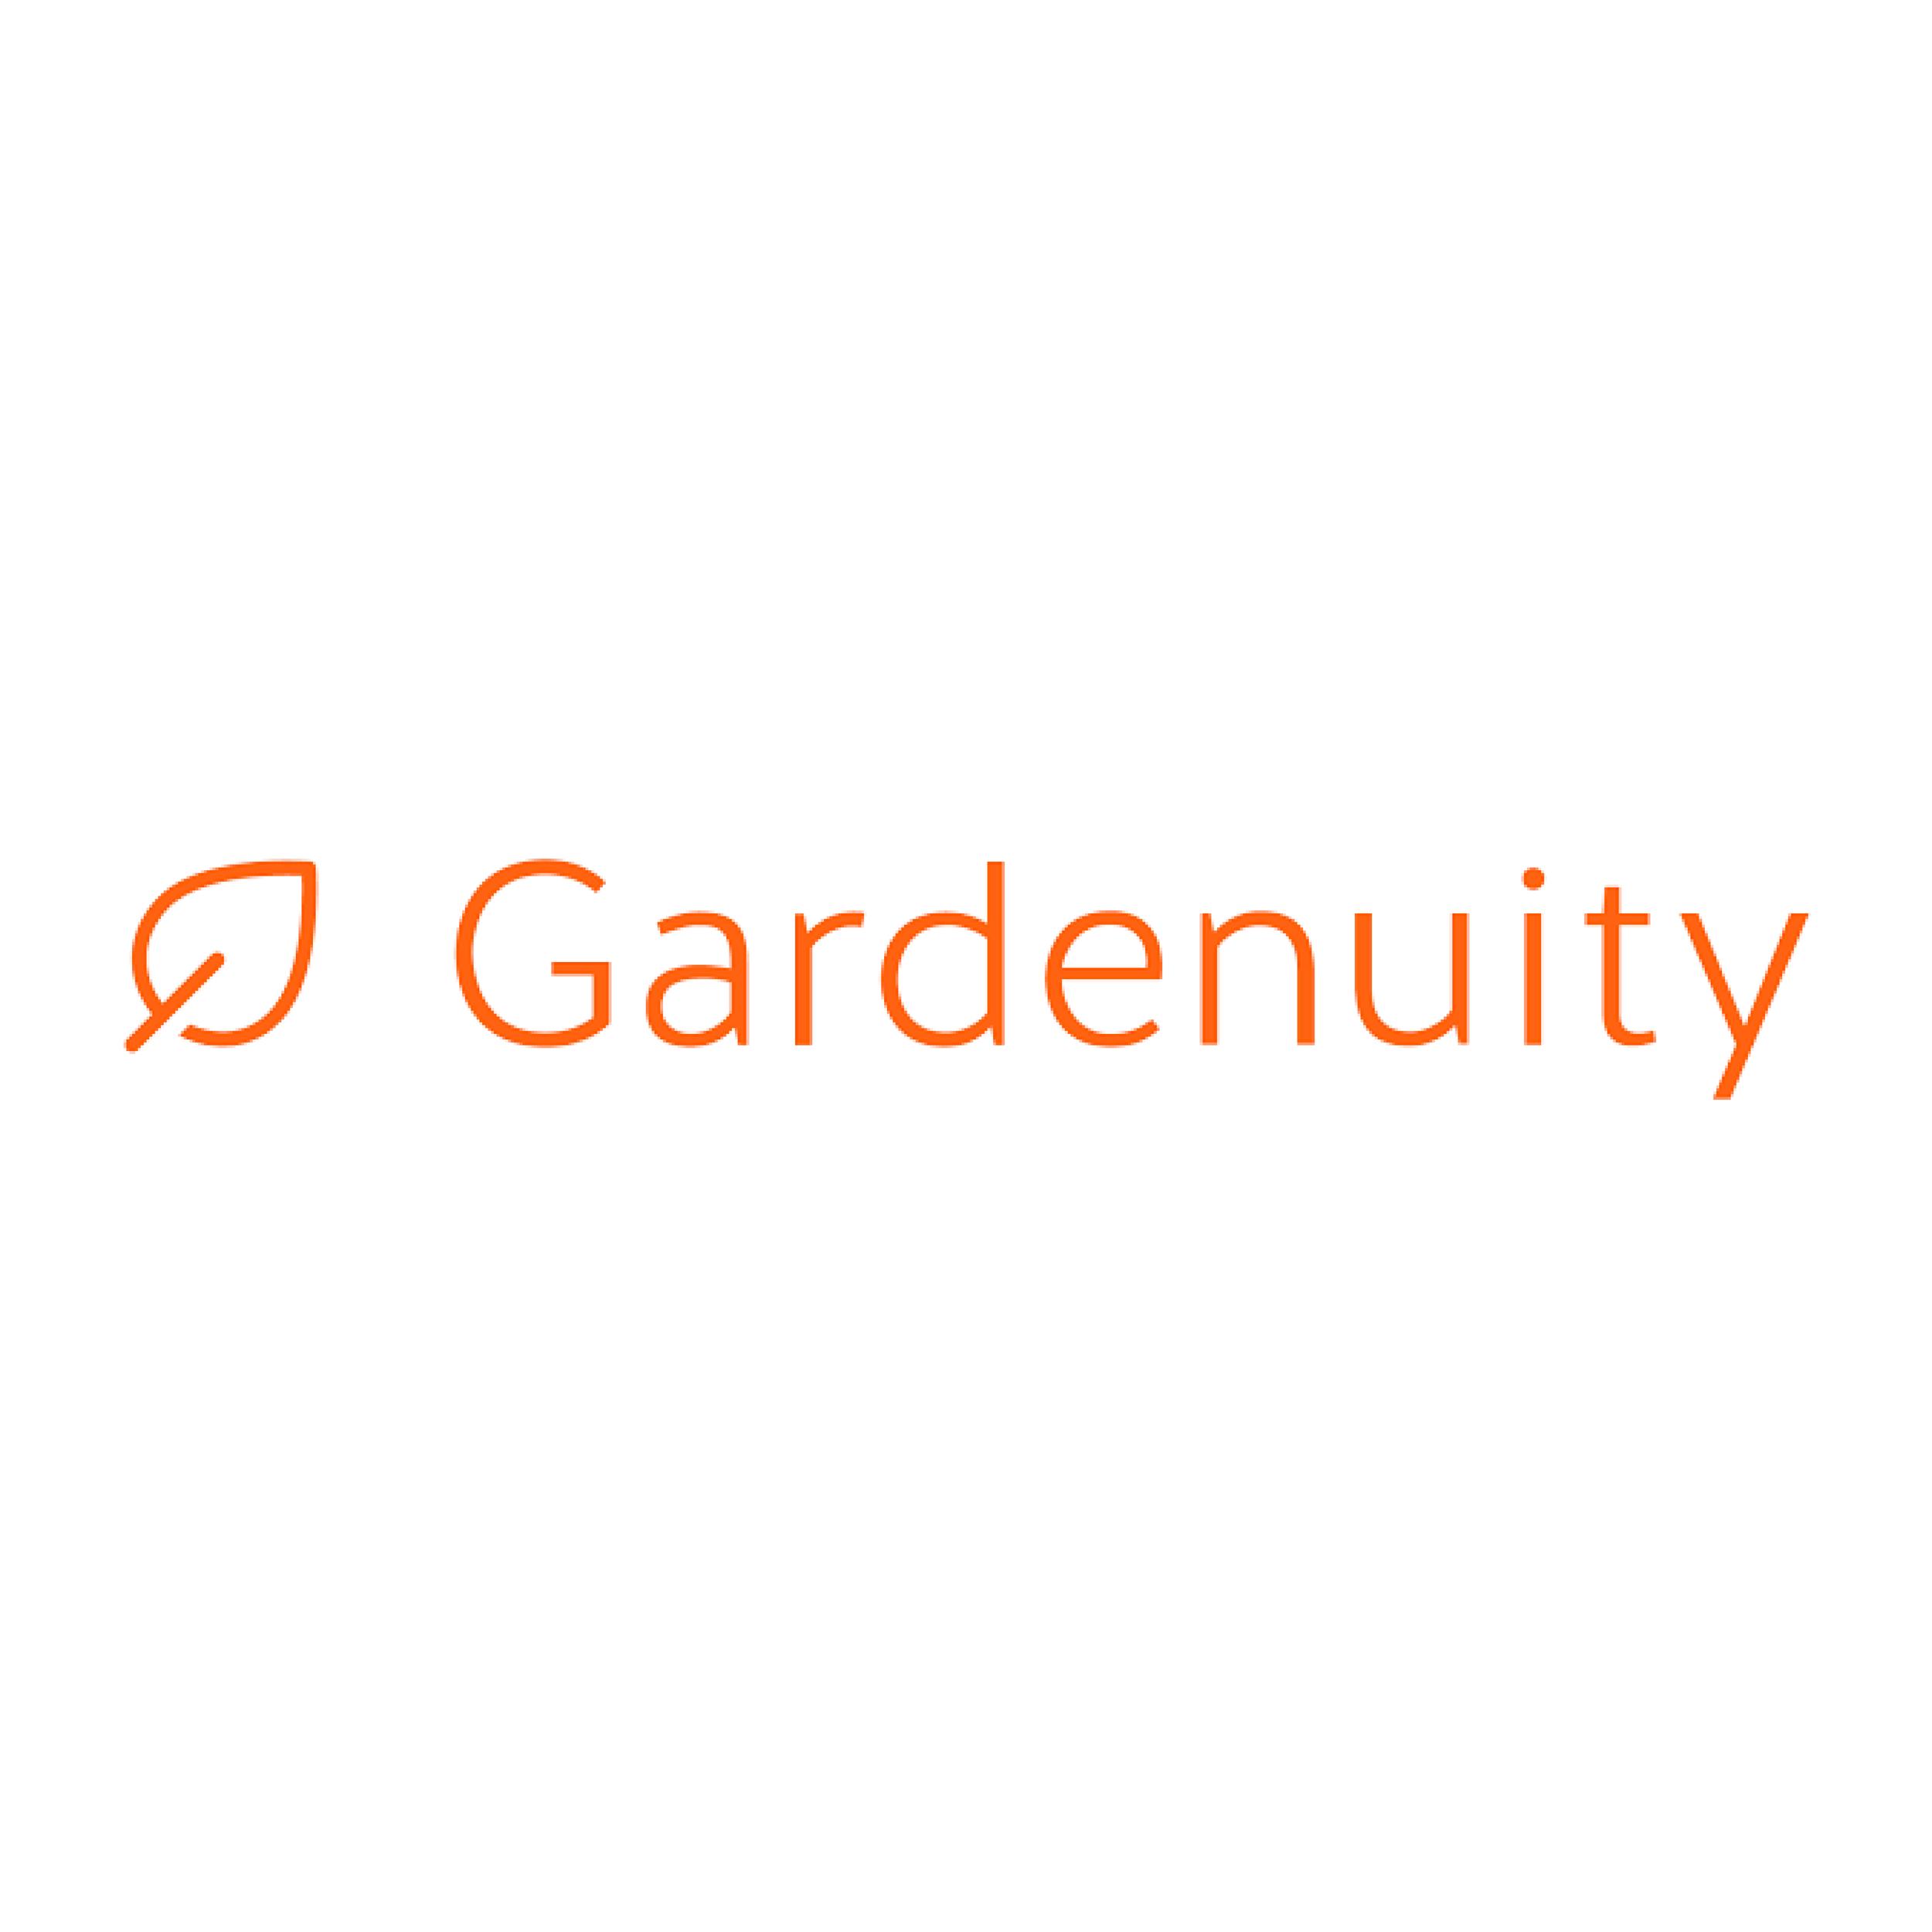 Gardenuity(logo-website)-01.png